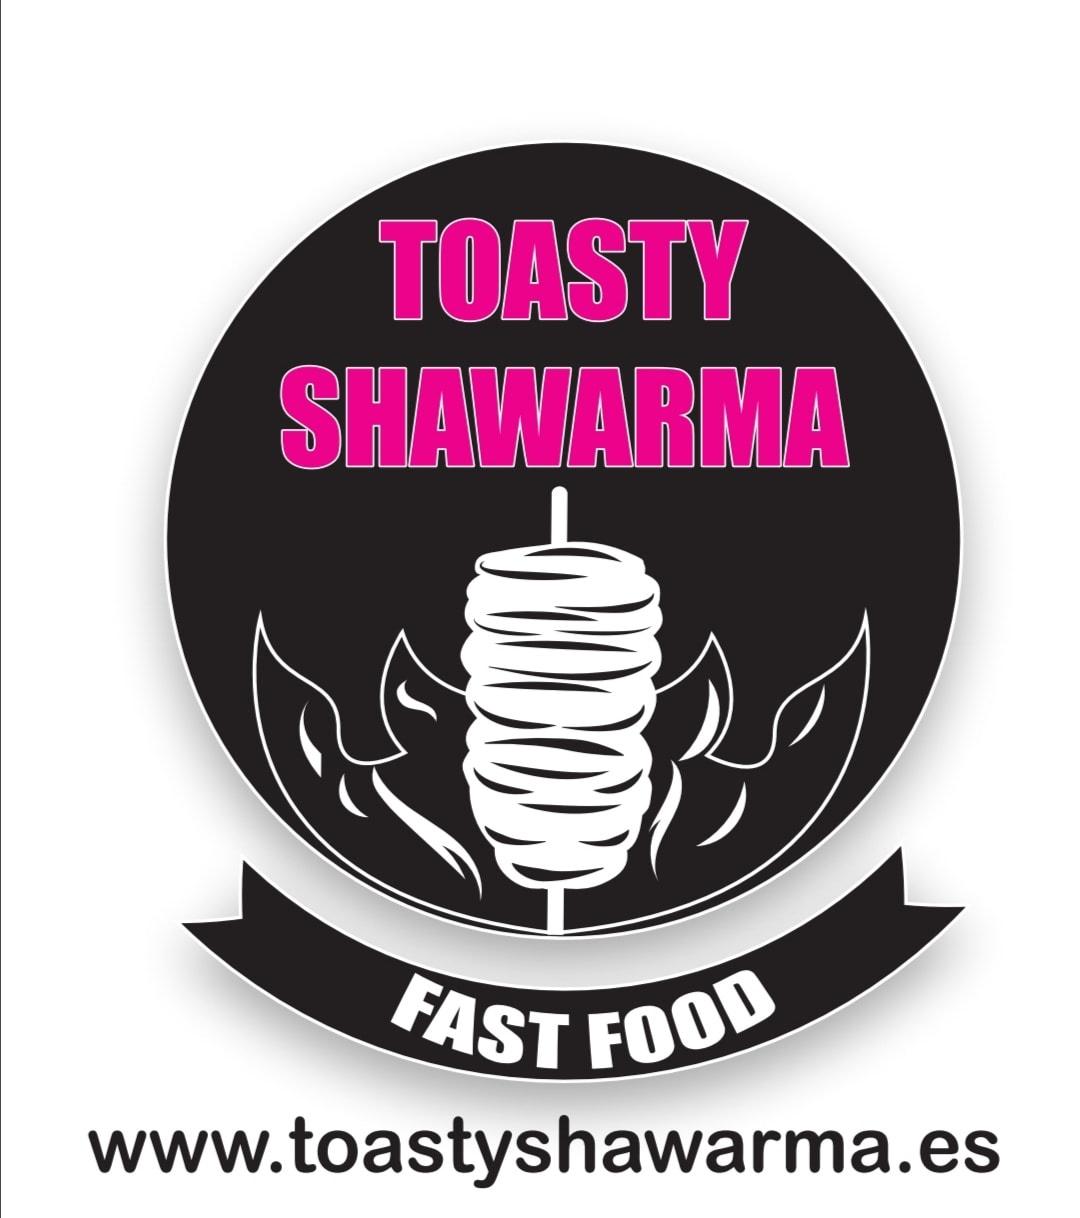 ToastyShawarma FastFood